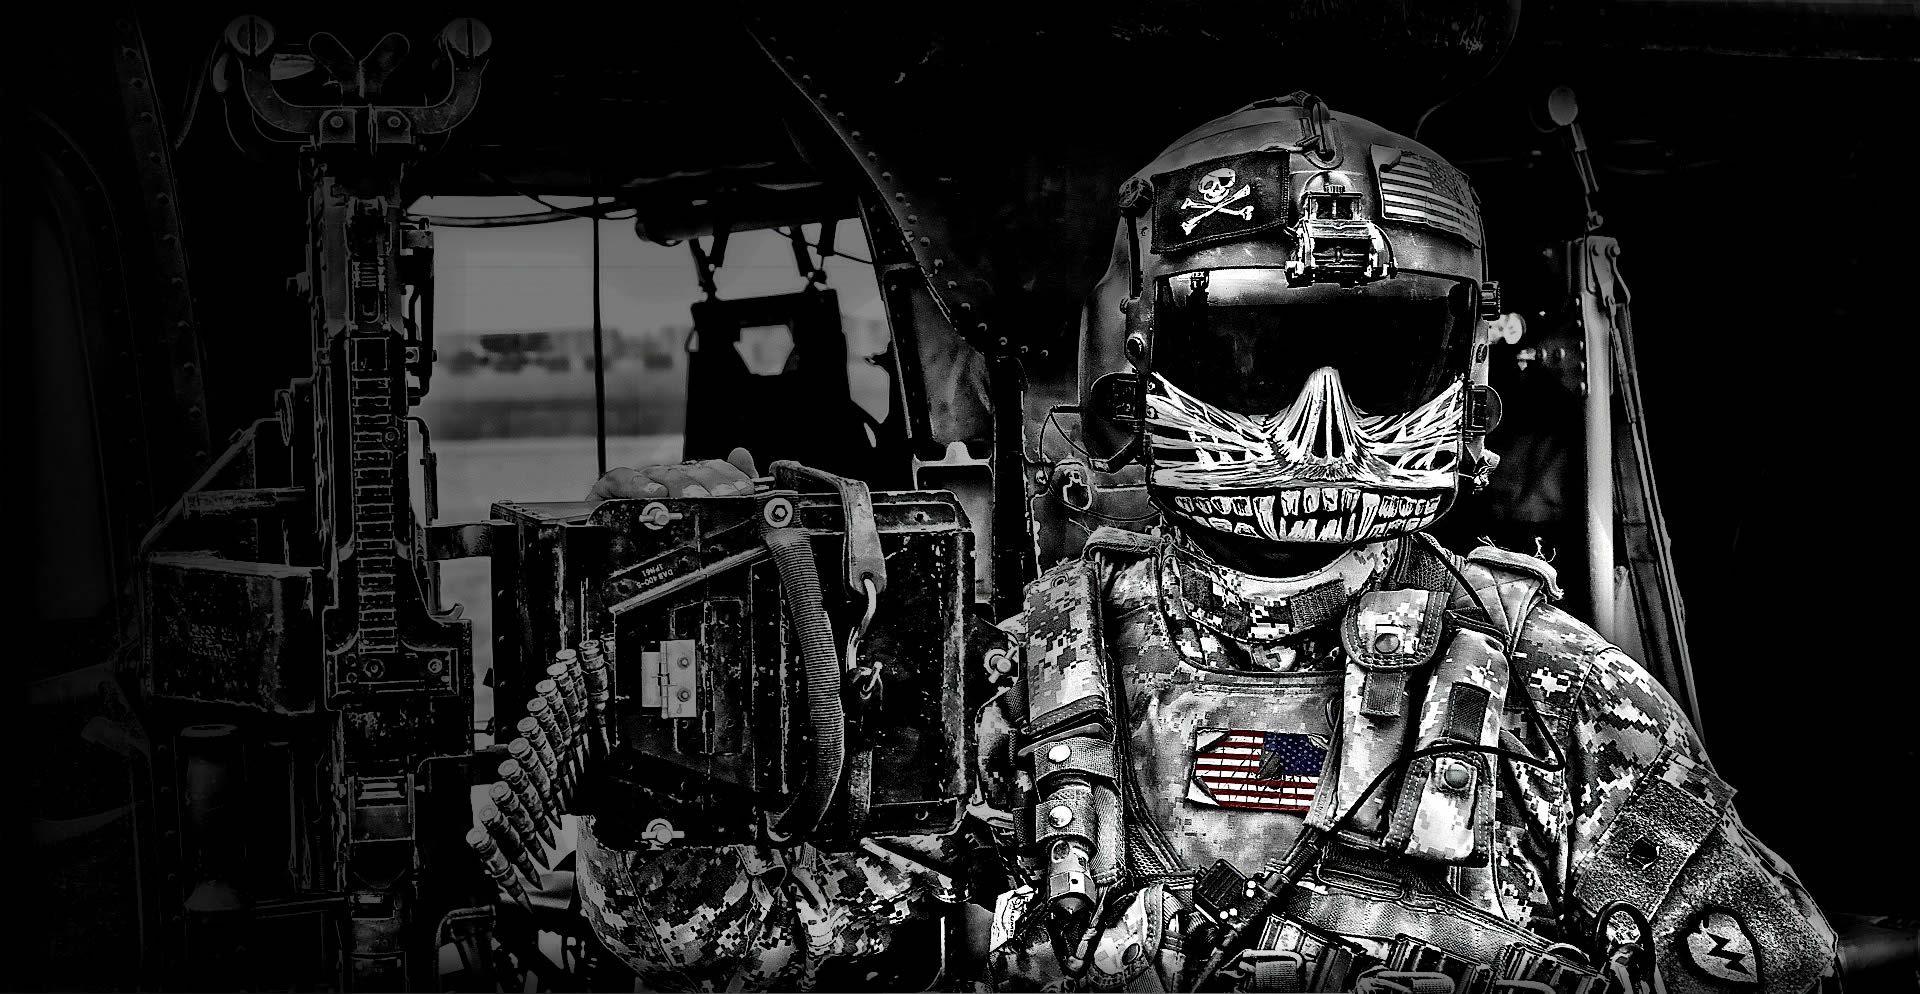 America's Navy Wallpaper - WallpaperSafari |Army Wife Desktop Background